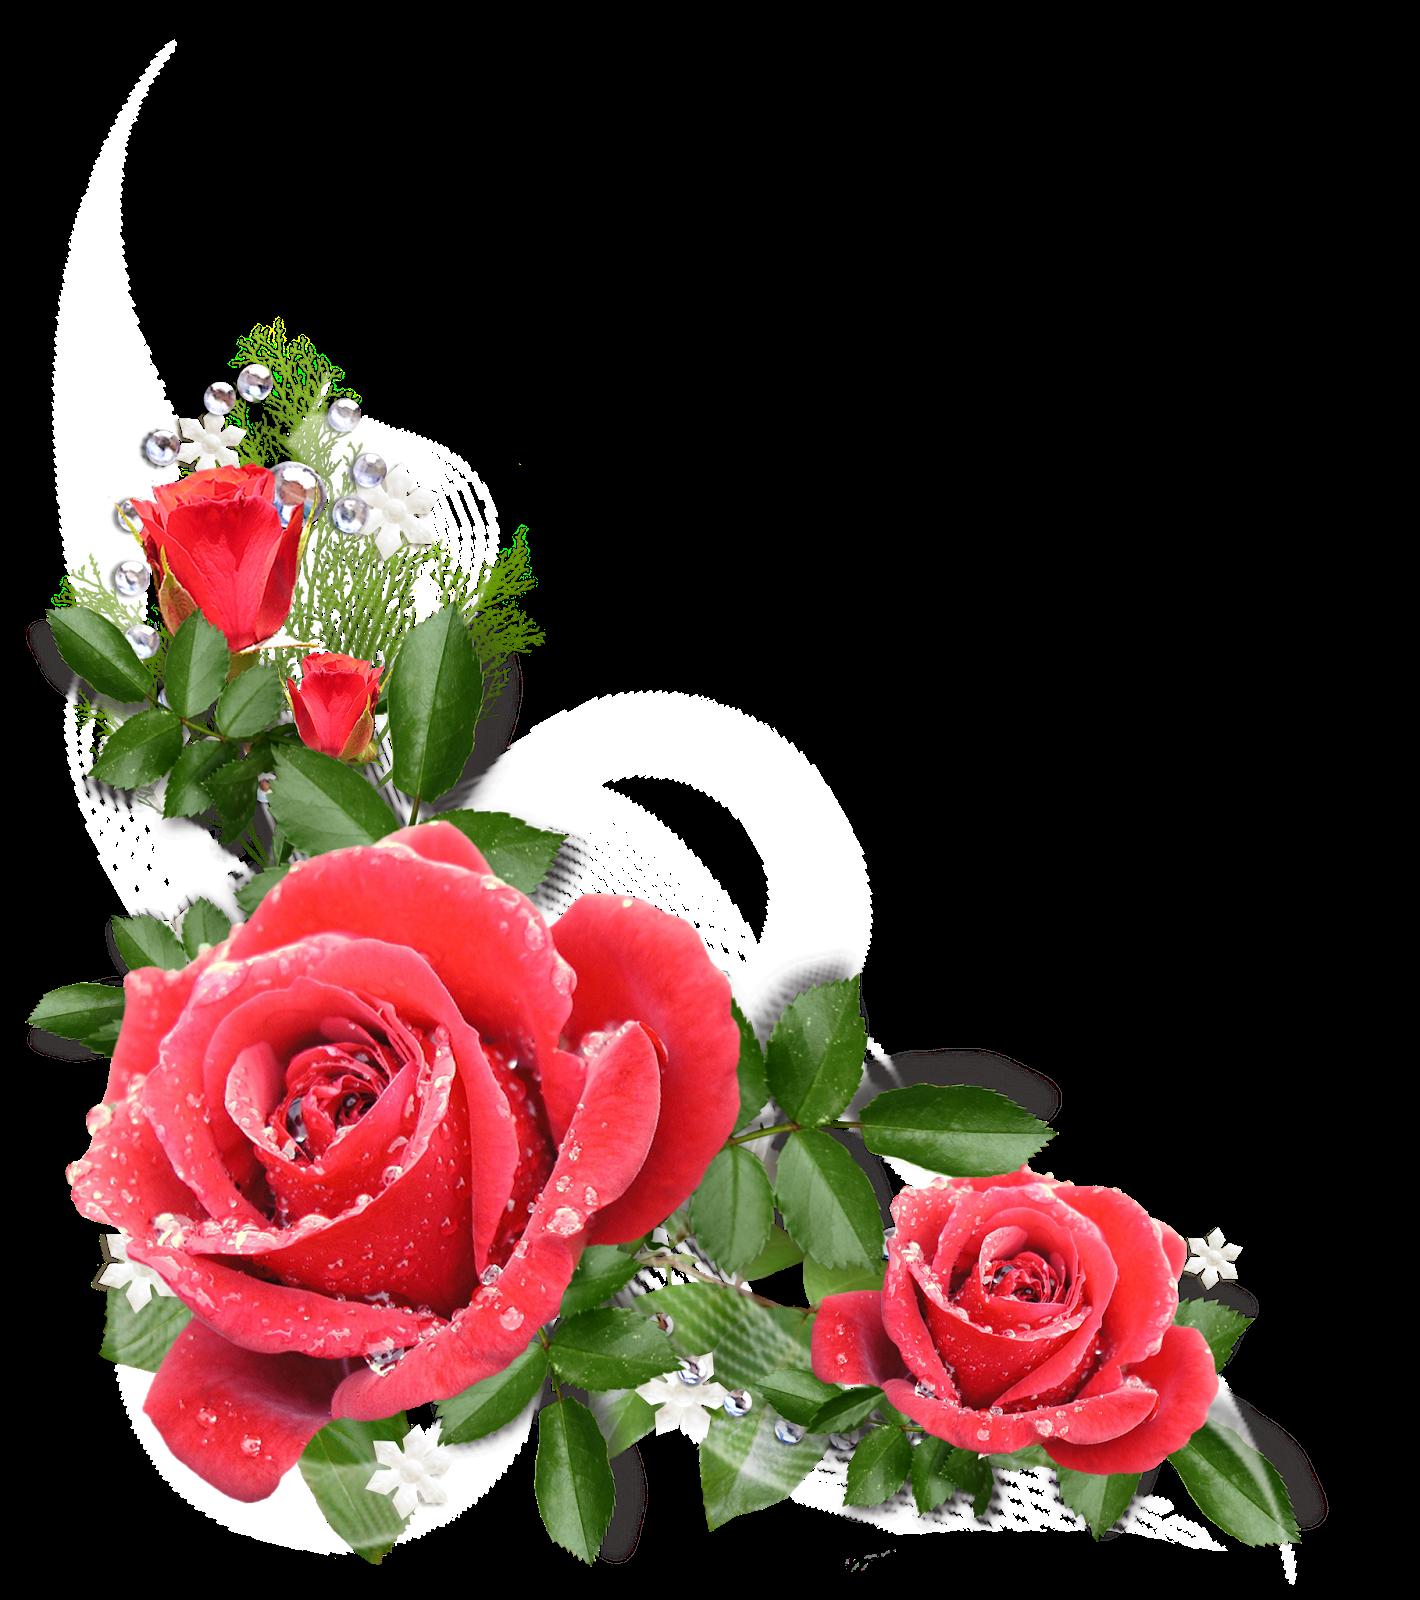 Marcos Para Fotos De Flores